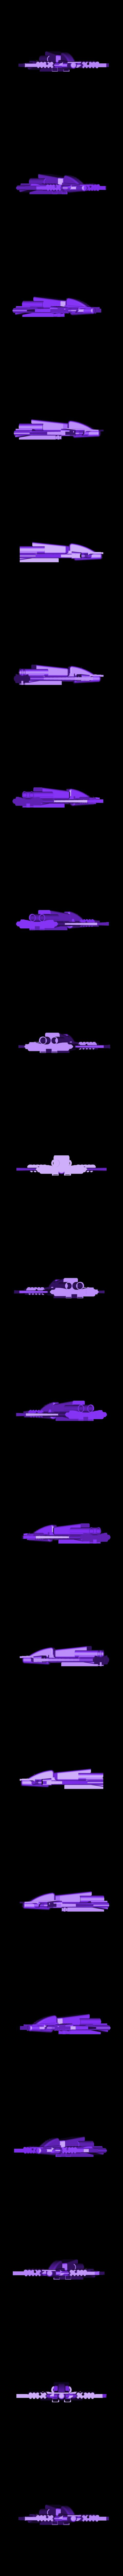 starfighter_v11.stl Download free STL file Starfighter • 3D print object, squiqui